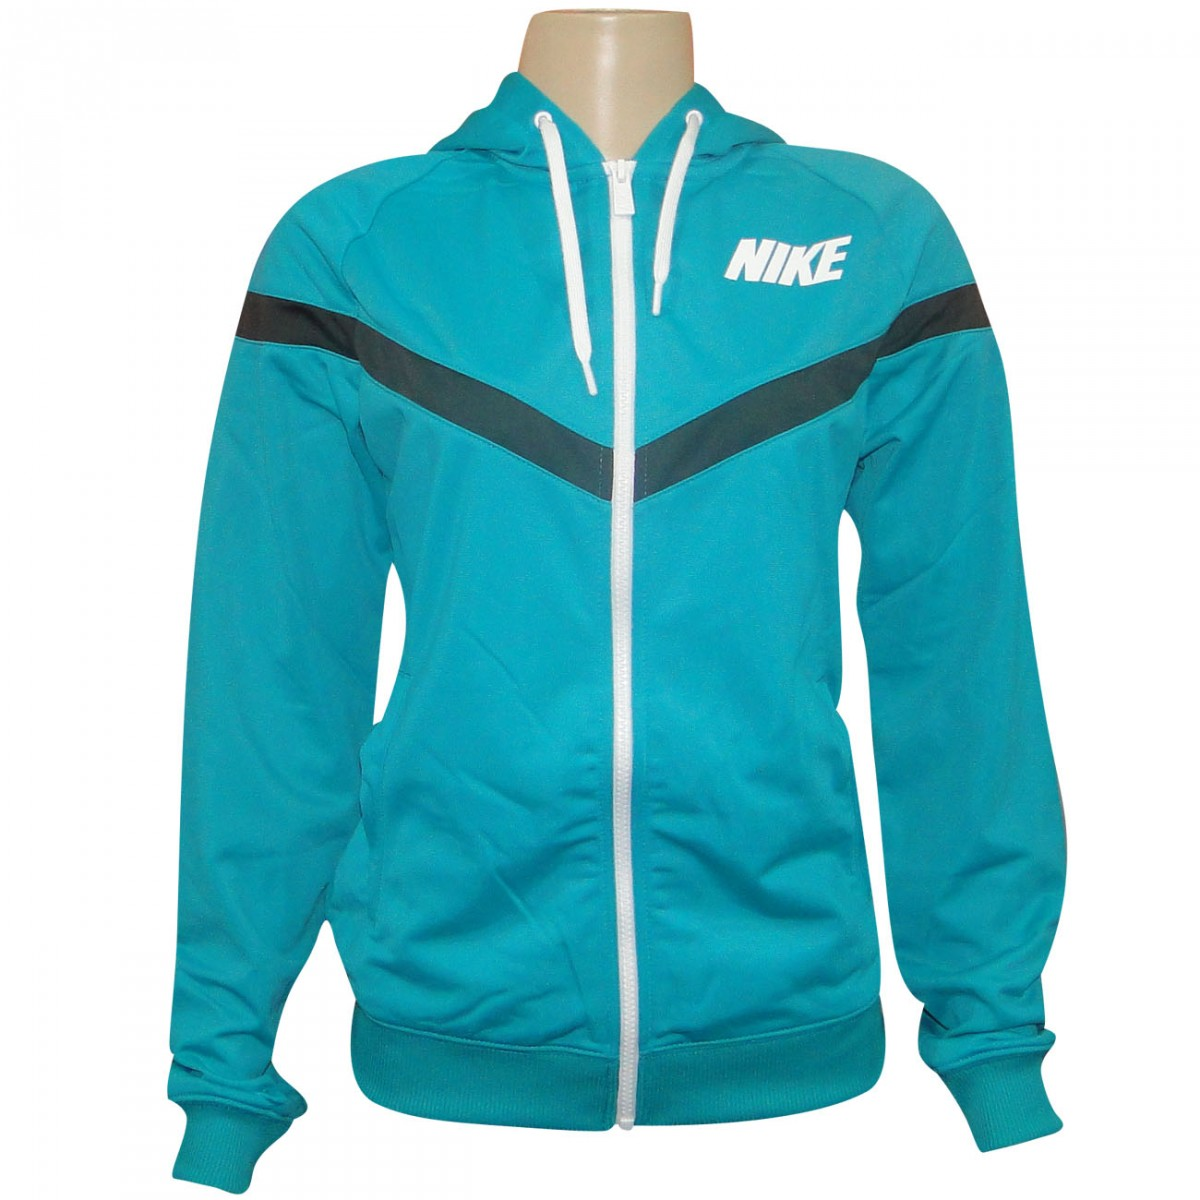 3fa07a5cd3f7c Agasalho Nike 545786 545786 320 - Verde Grafite Branco - Chuteira Nike